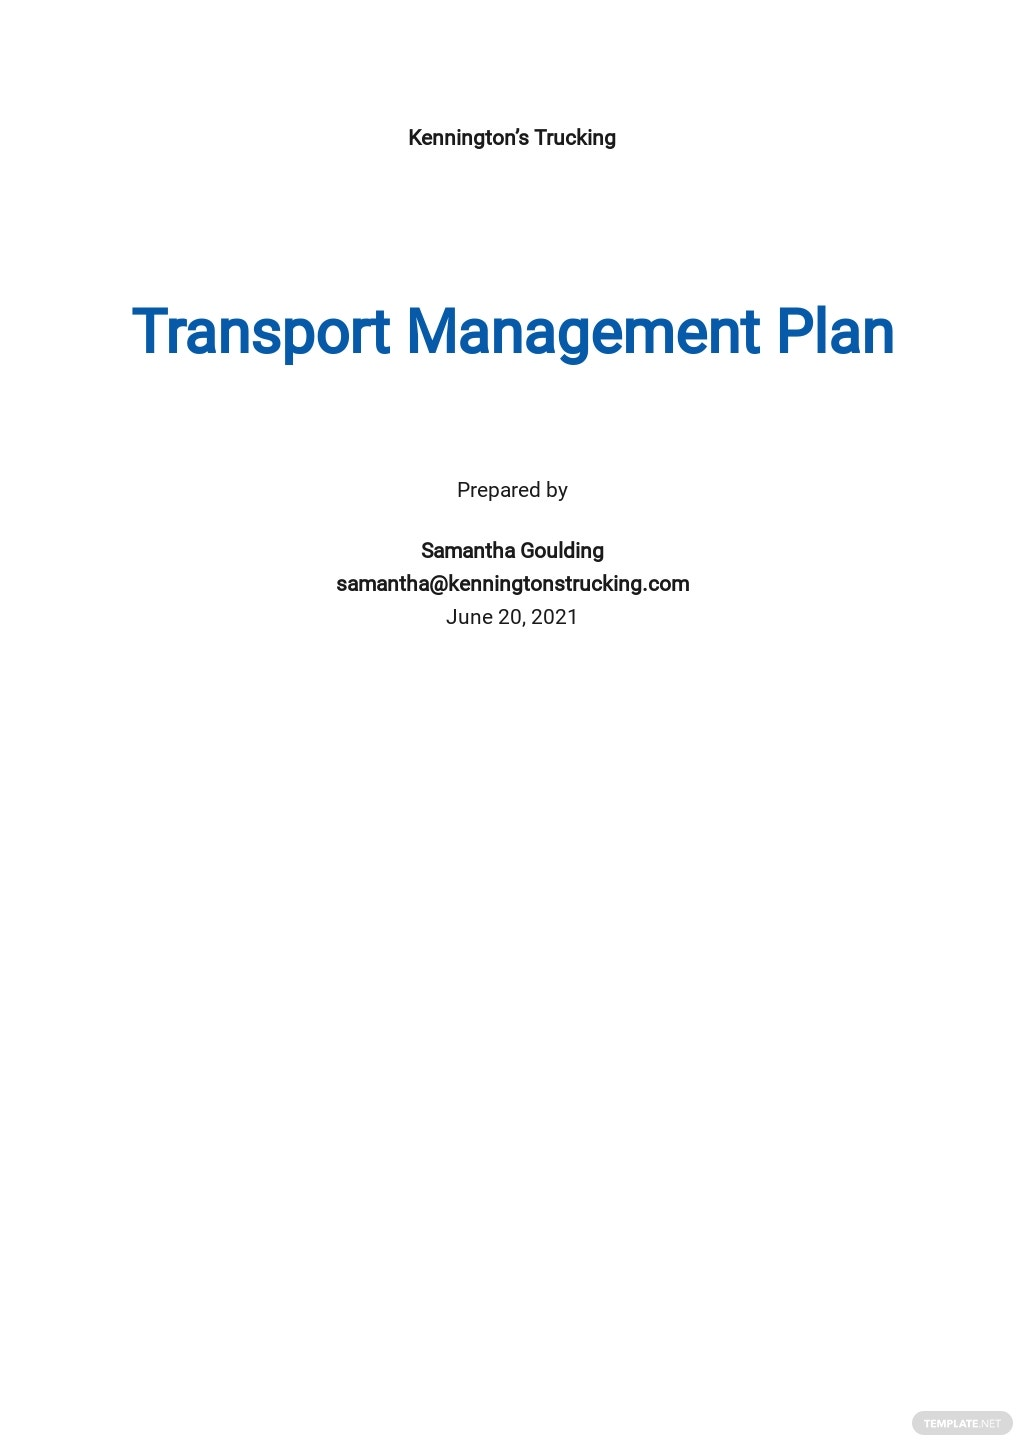 Transport Management Plan Template.jpe